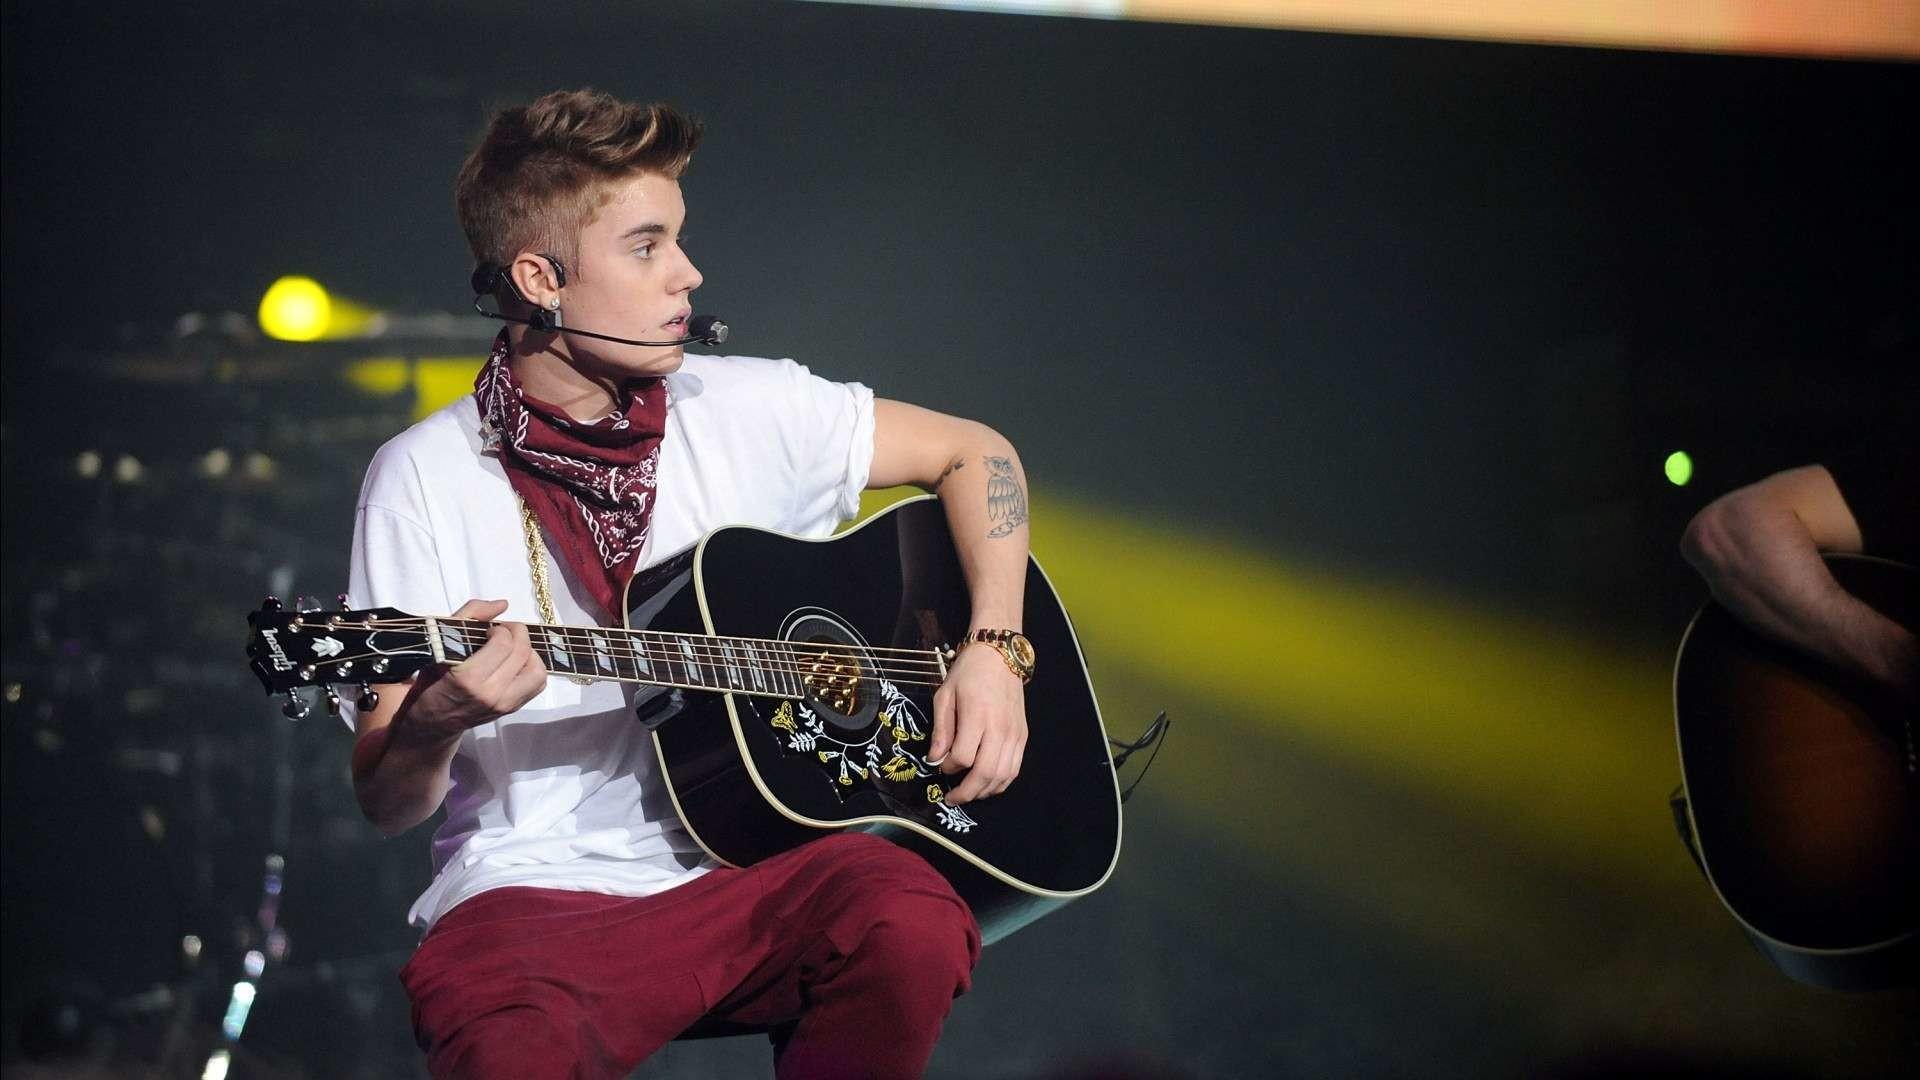 2048x1152 Justin Bieber HD Background